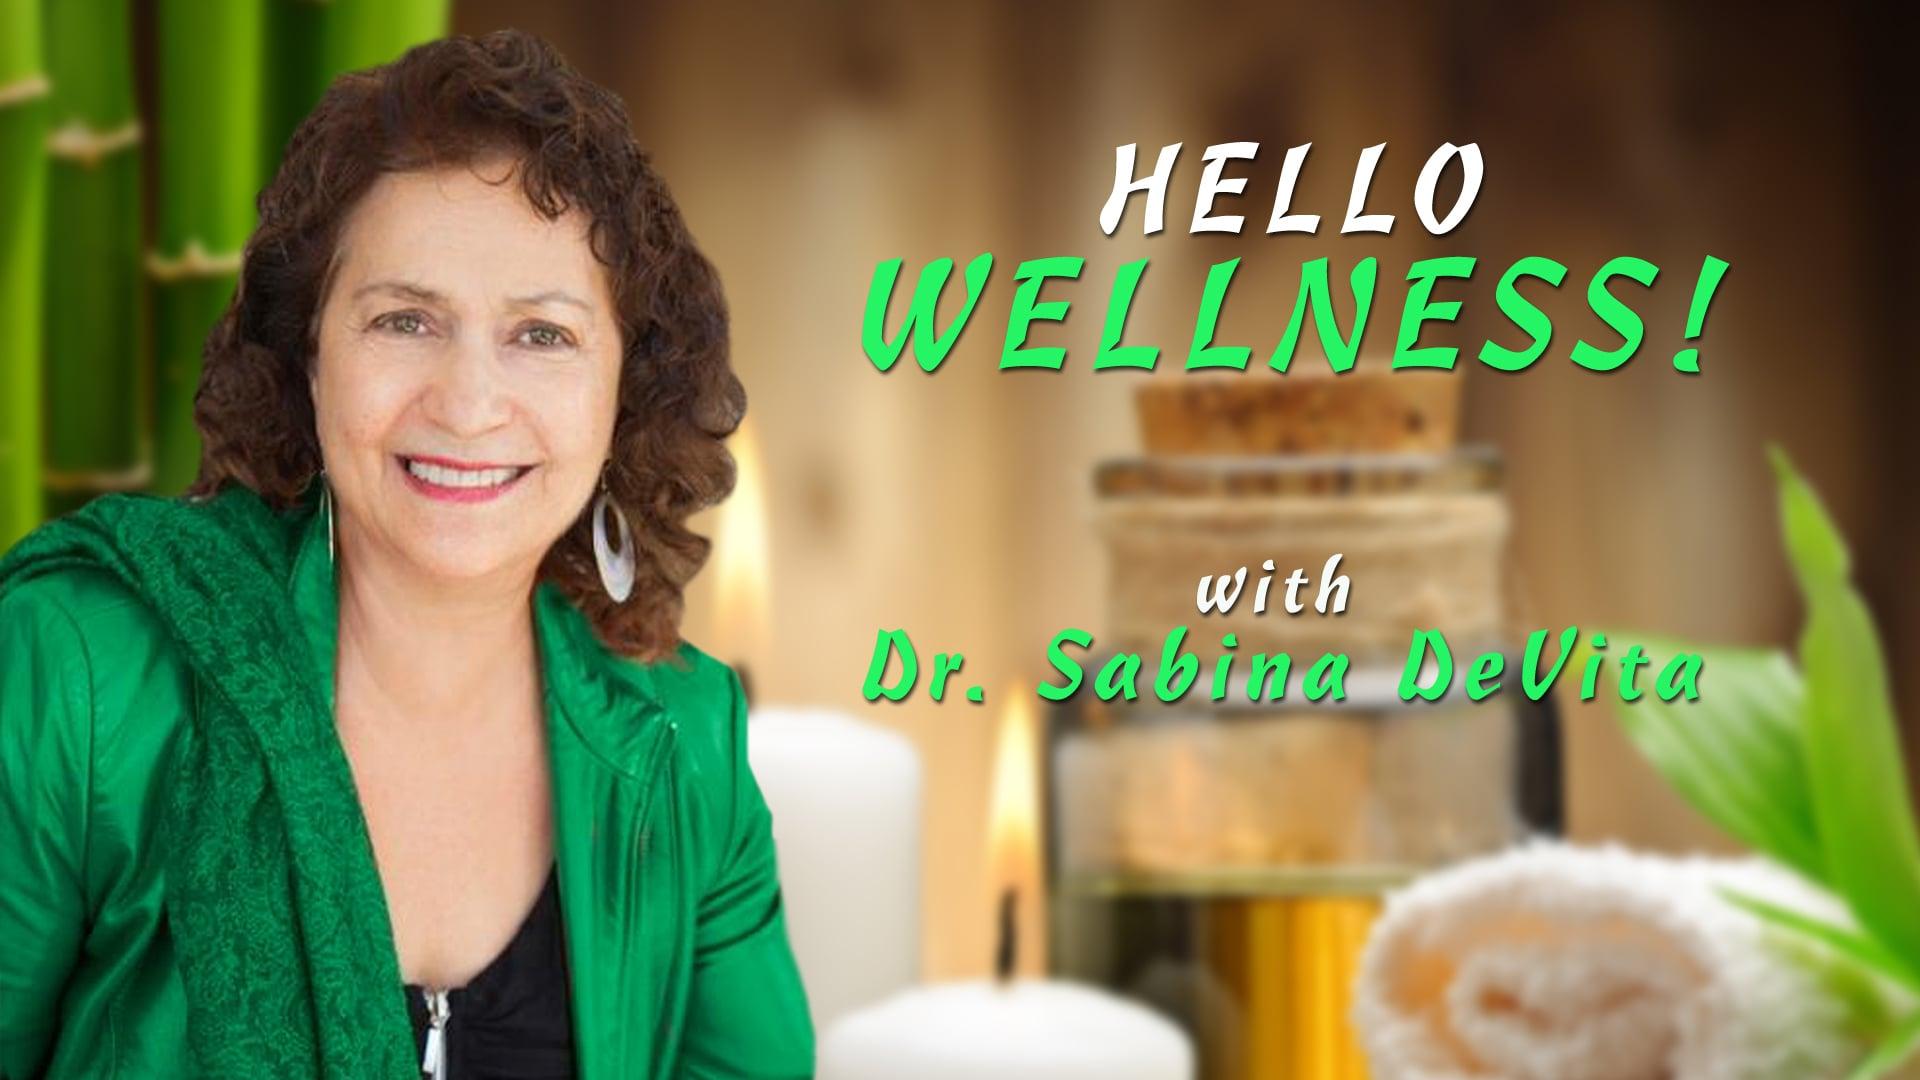 Hello Wellness! Higher Self Defined.